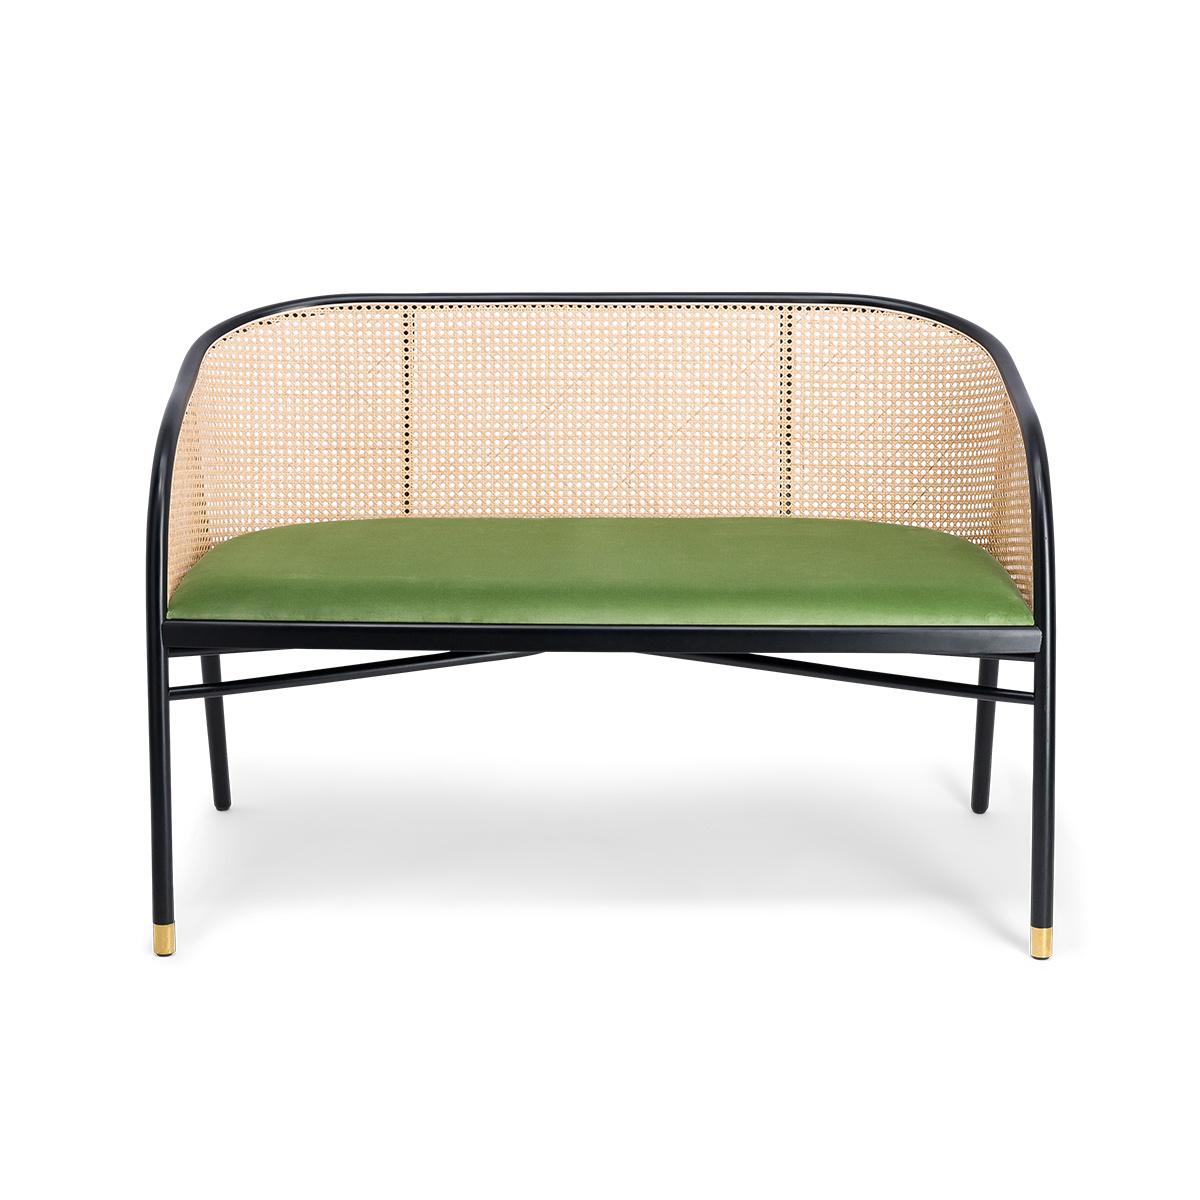 Cavallo Sofa, Almond Green Velvet with Black Lacquered Frame